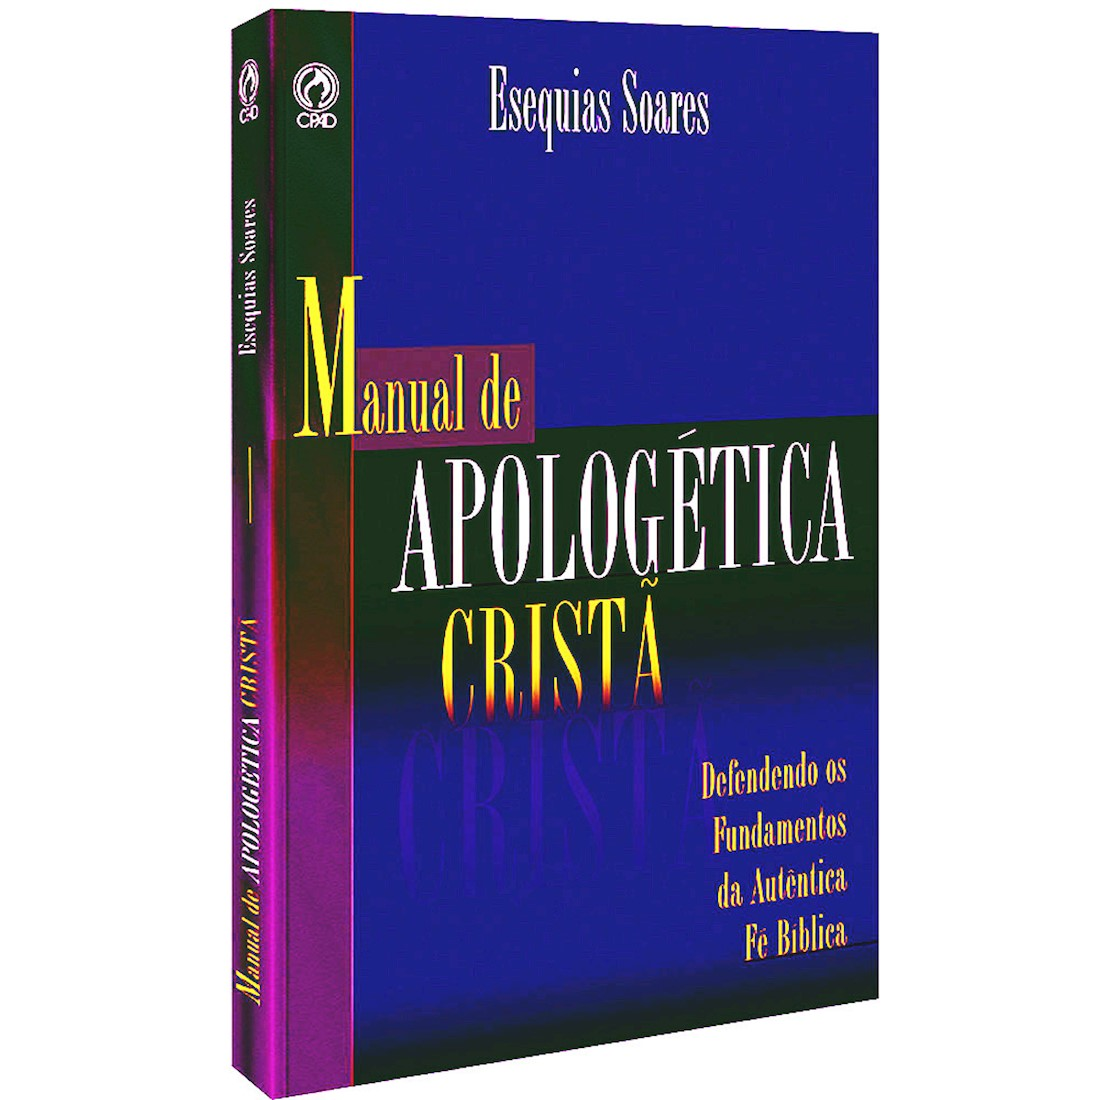 Livro Manual de Apologética Cristã